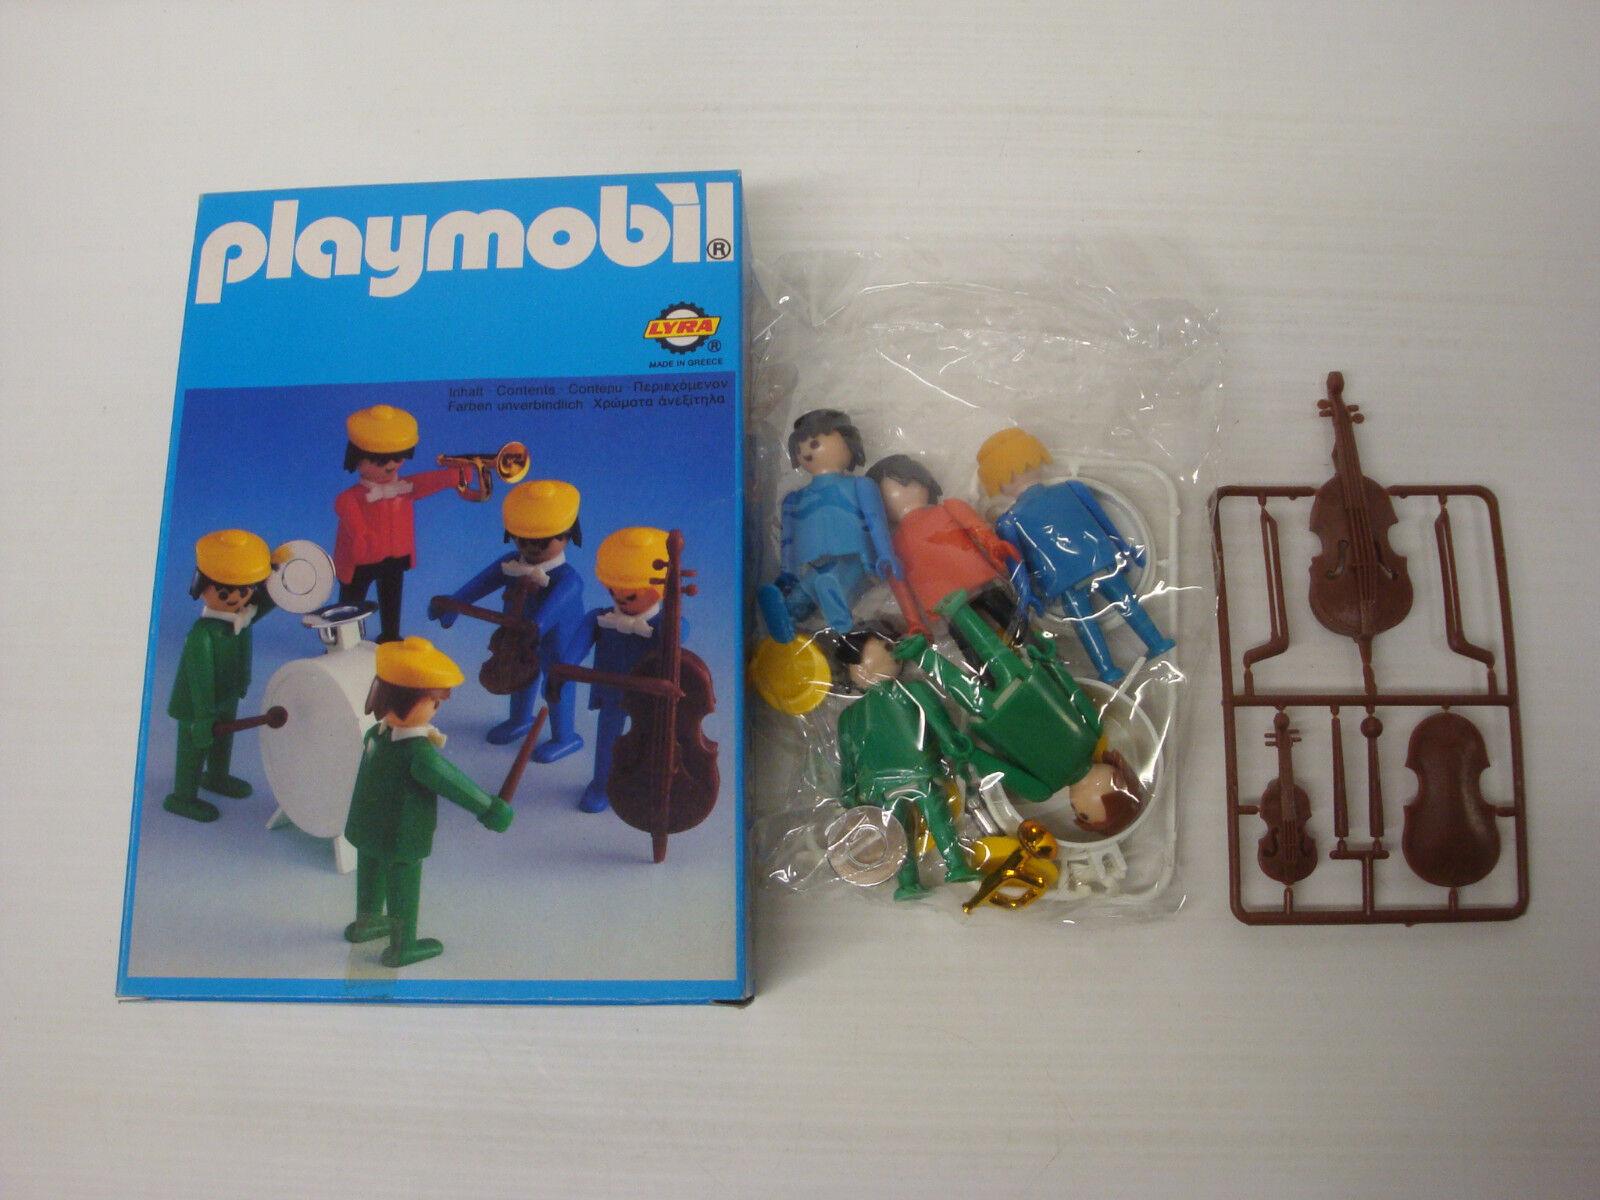 Playmobil LYRA état neuf en boite sachet scellé - groupe musiciens 3L41